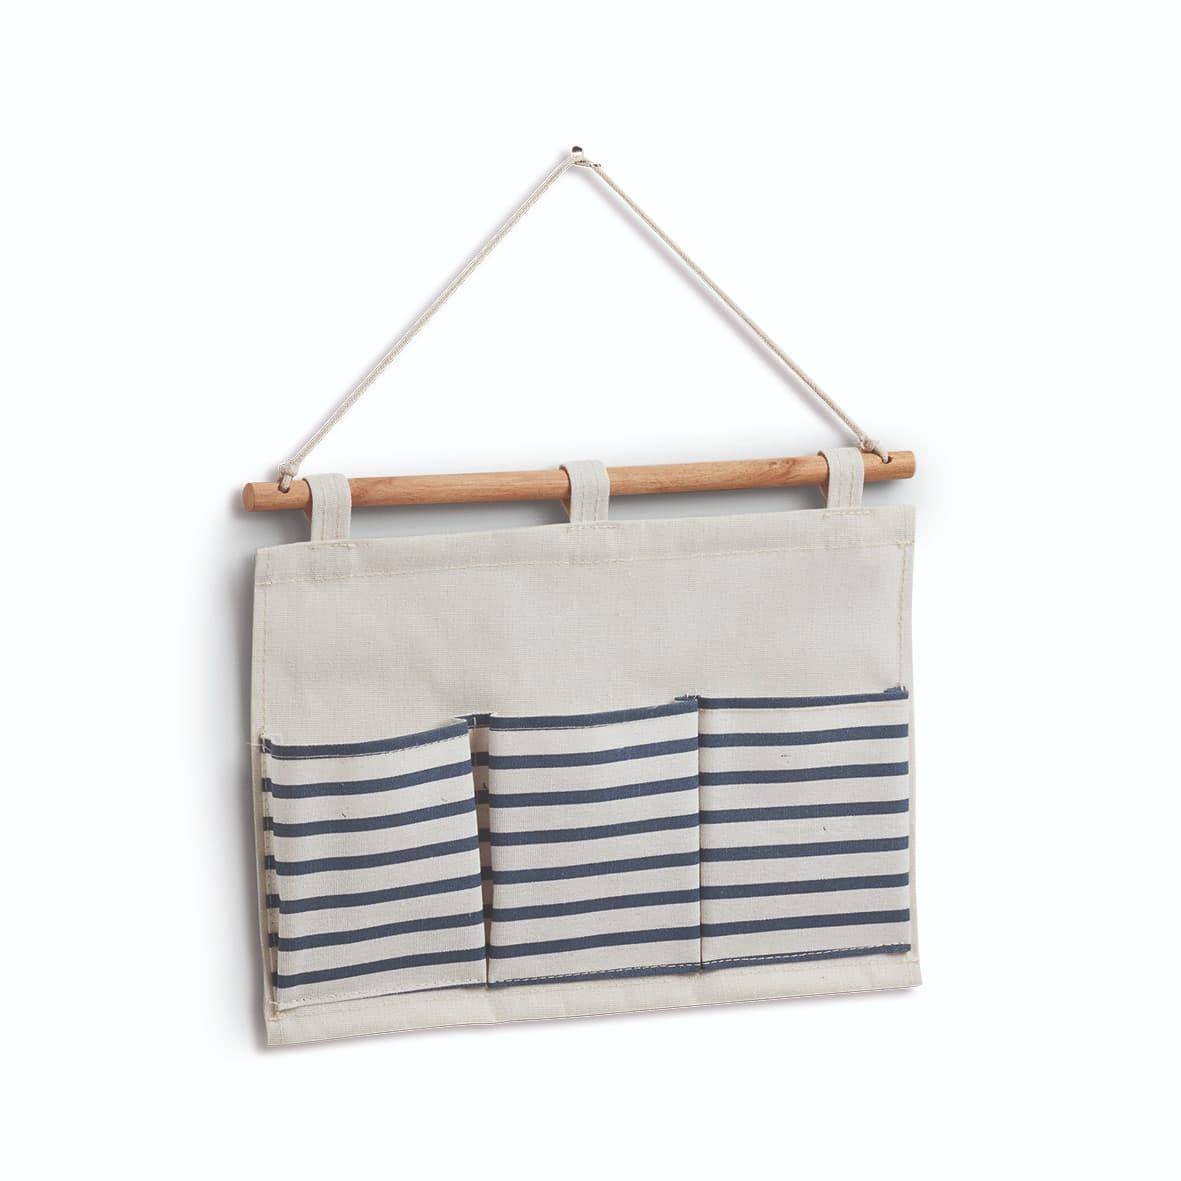 Organizator textil de perete cu 3 compartimente, Stripes Alb / Bleumarin, l35xH25 cm poza